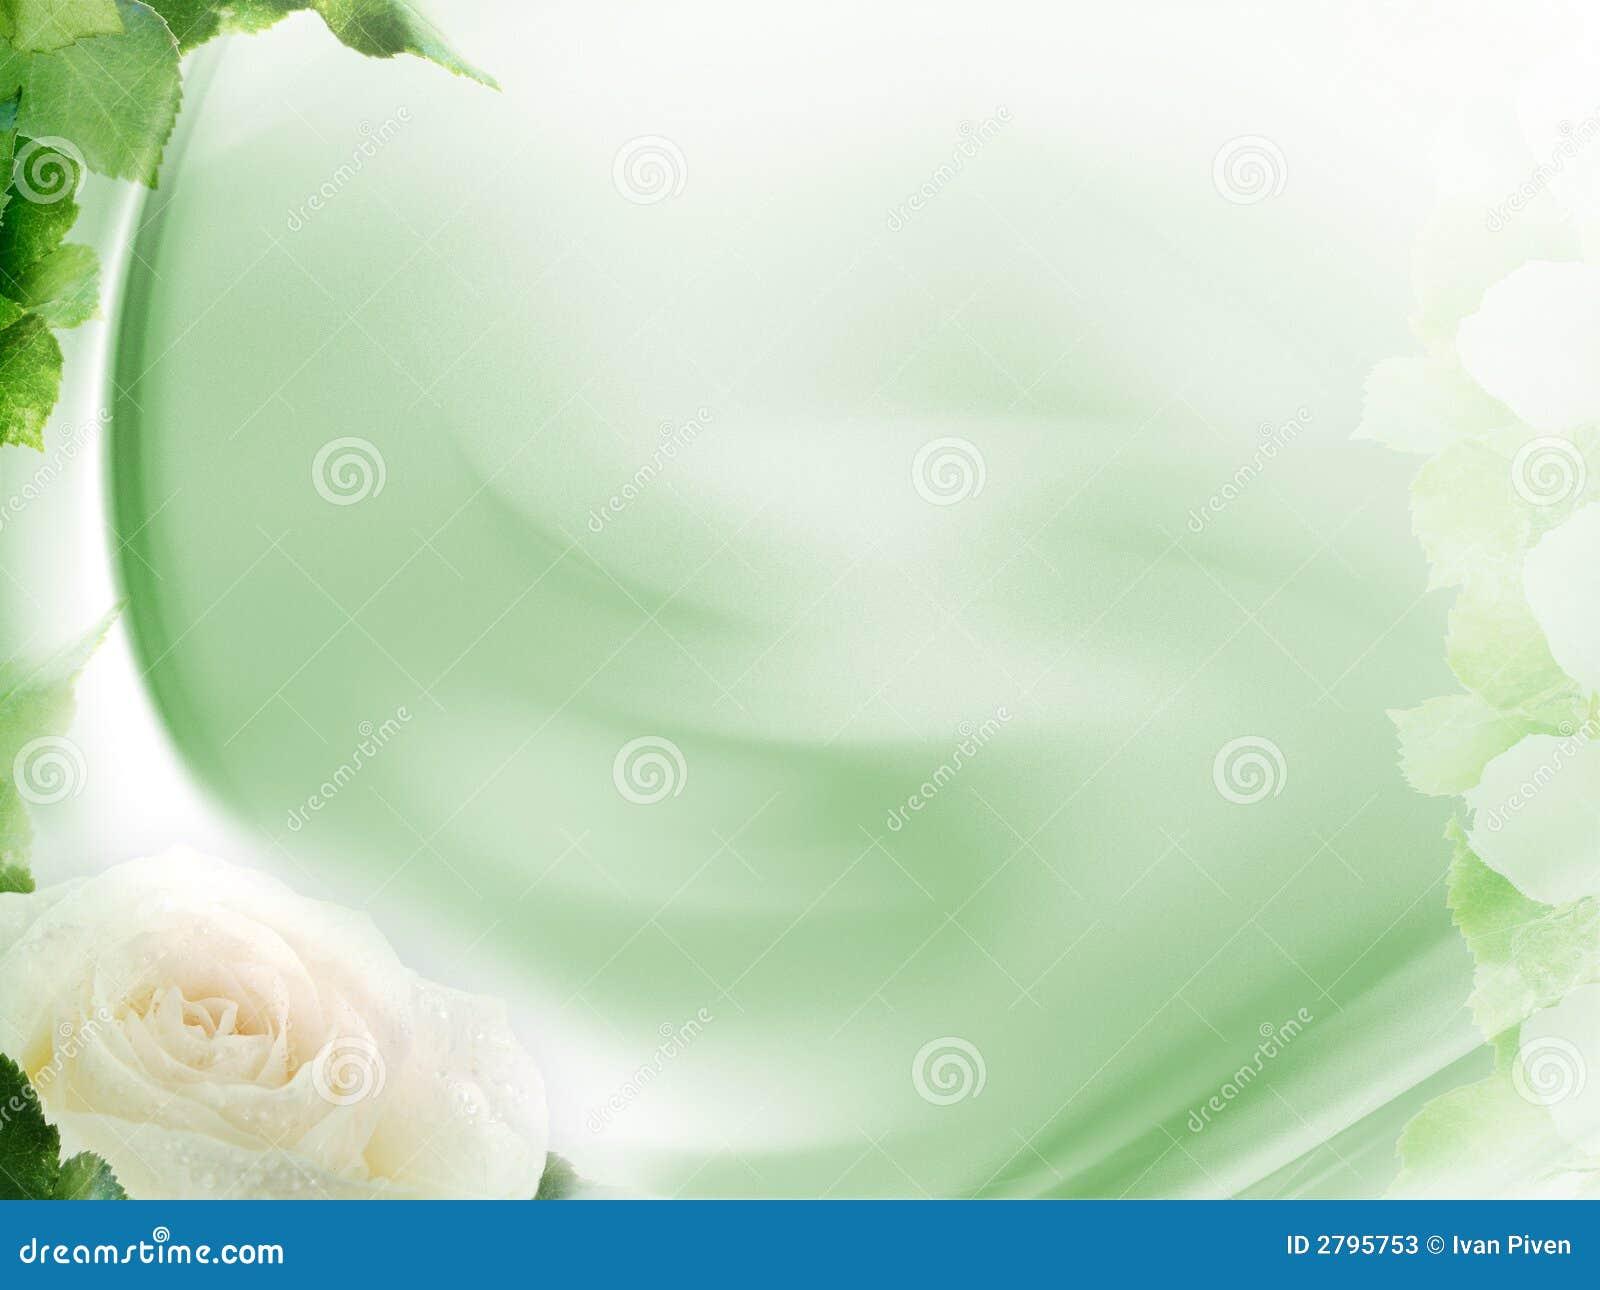 Beautiful Design Background Stock Photos Image 2795753